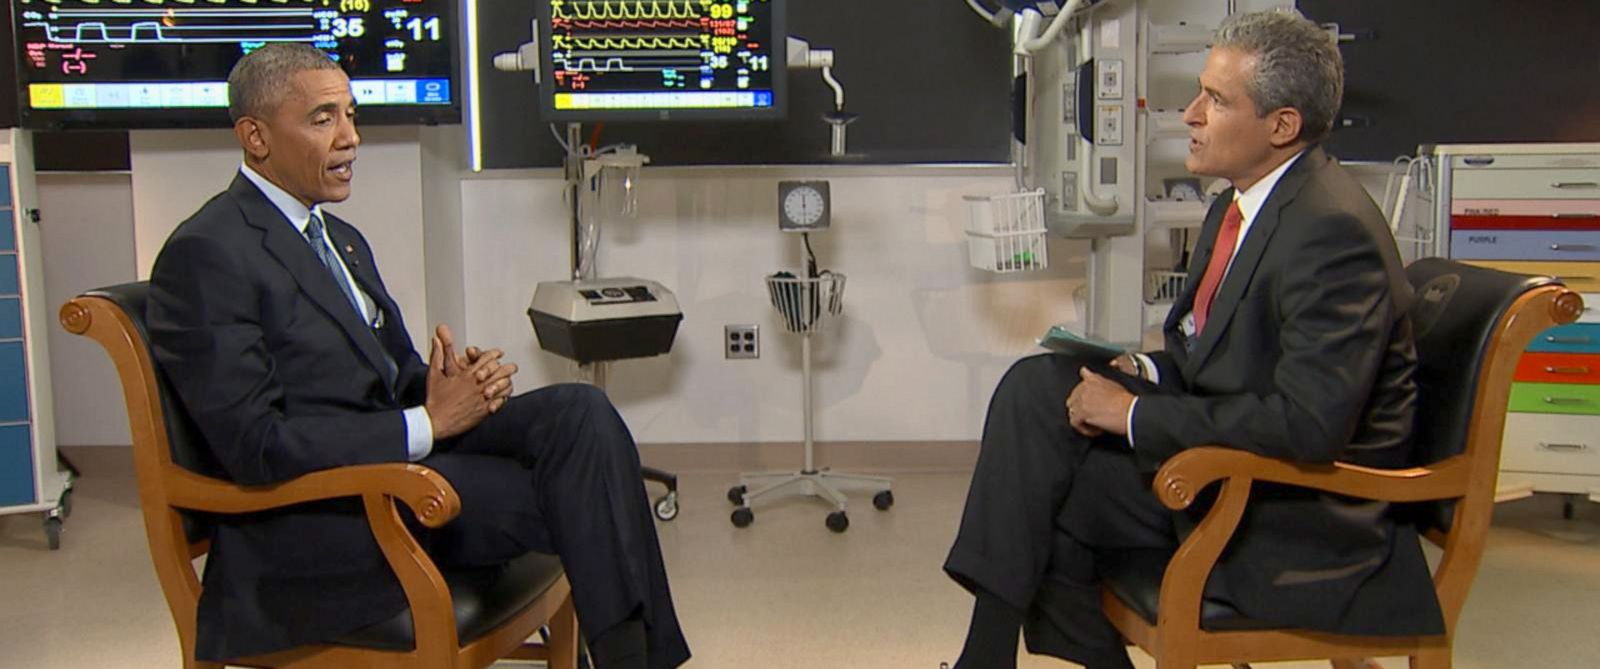 PHOTO: ABC News Dr. Richard Besser interviews President Obama.